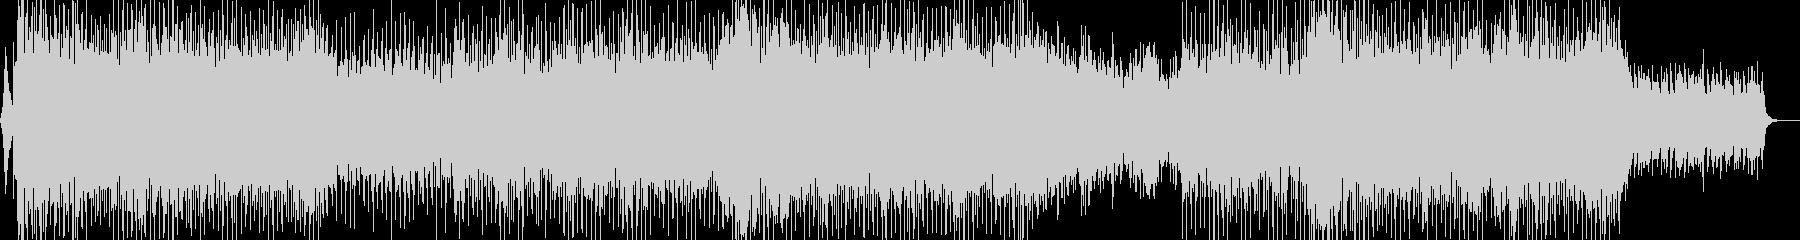 EDMポップで明るいクラブ系-15の未再生の波形